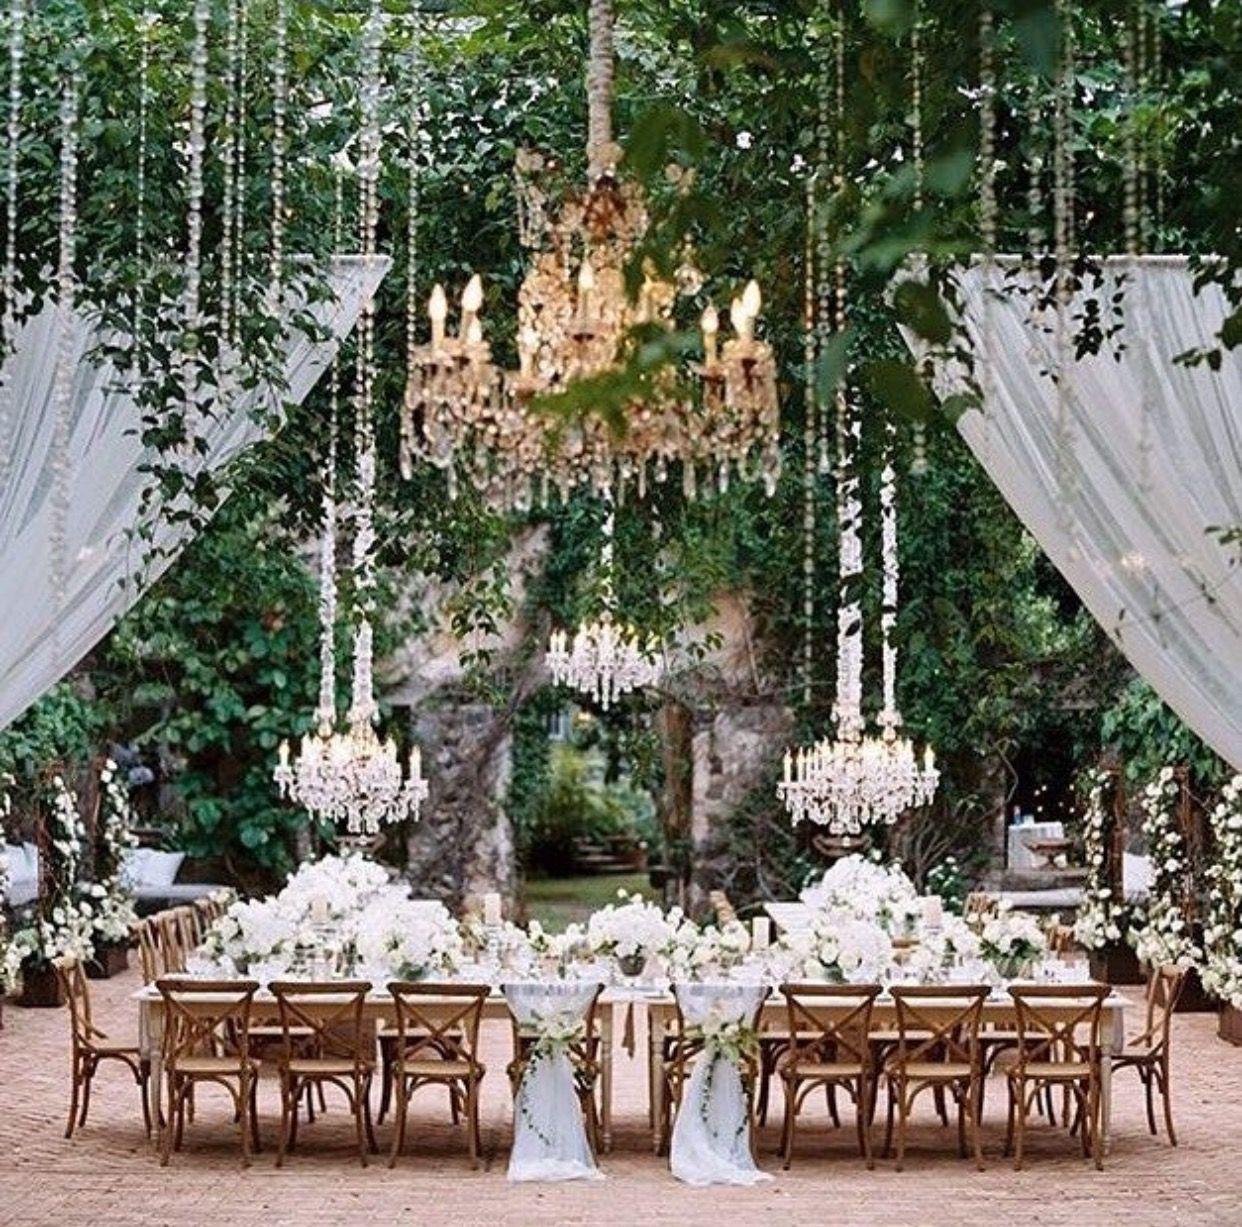 #weddingtablescape #weddingtabledecor #outdoor #